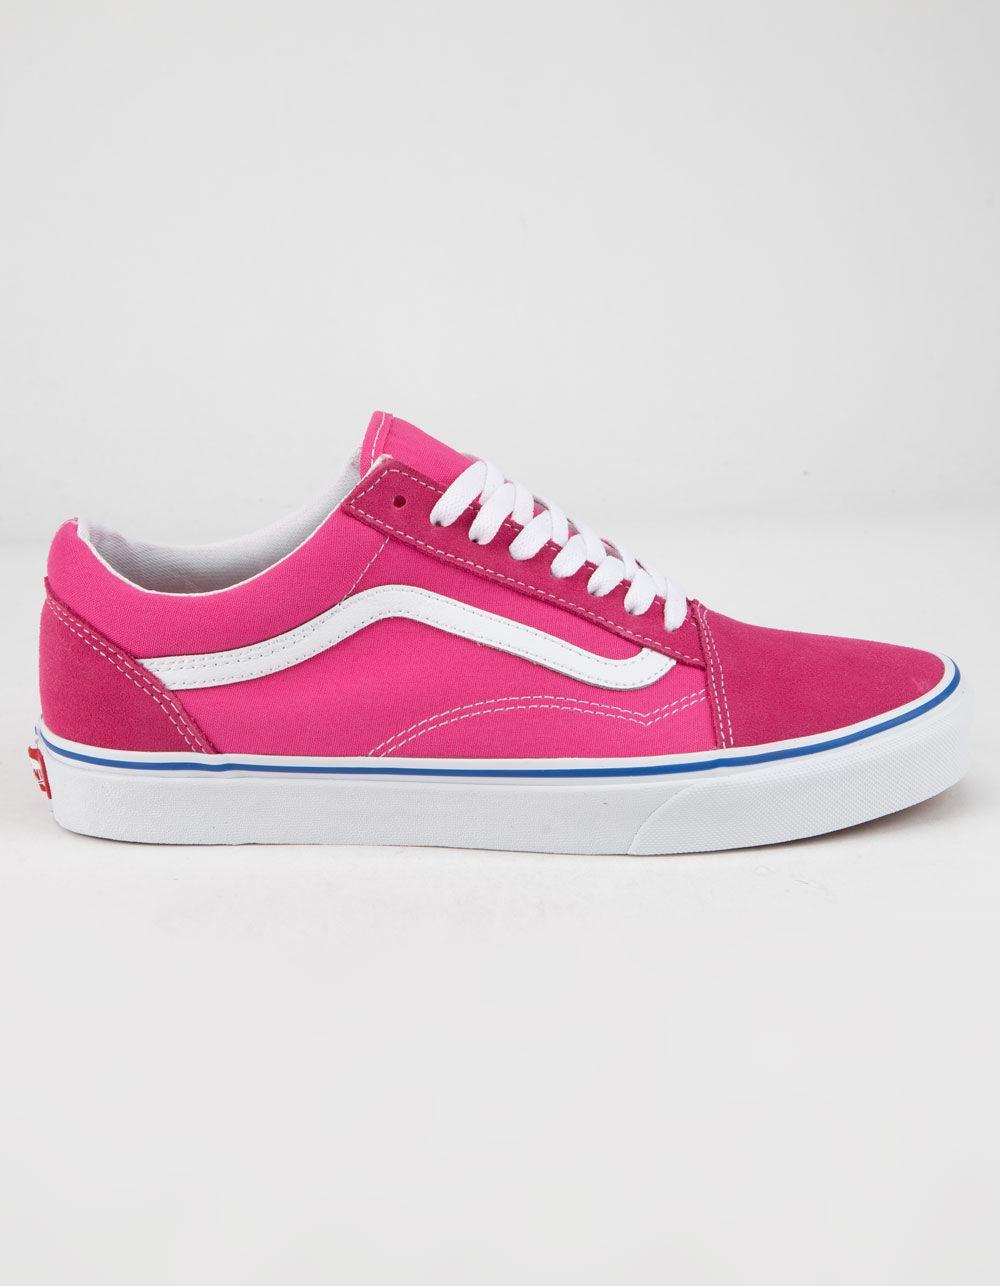 06bd66e66199 Lyst - Vans Suede Canvas Old Skool Carmine Rose Shoes in Pink